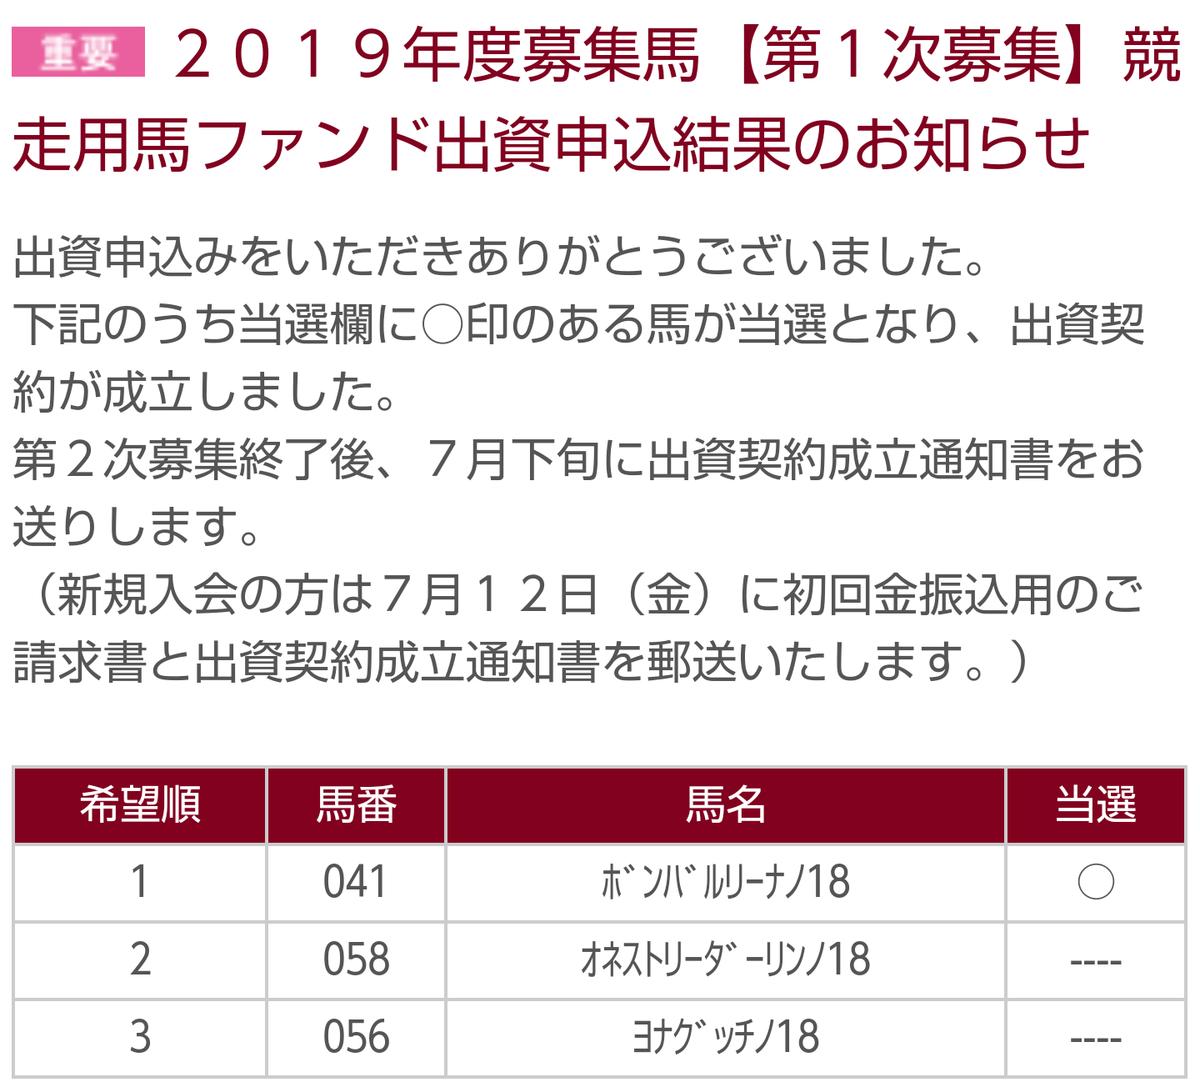 f:id:kurokiri-G1:20190706203212p:plain